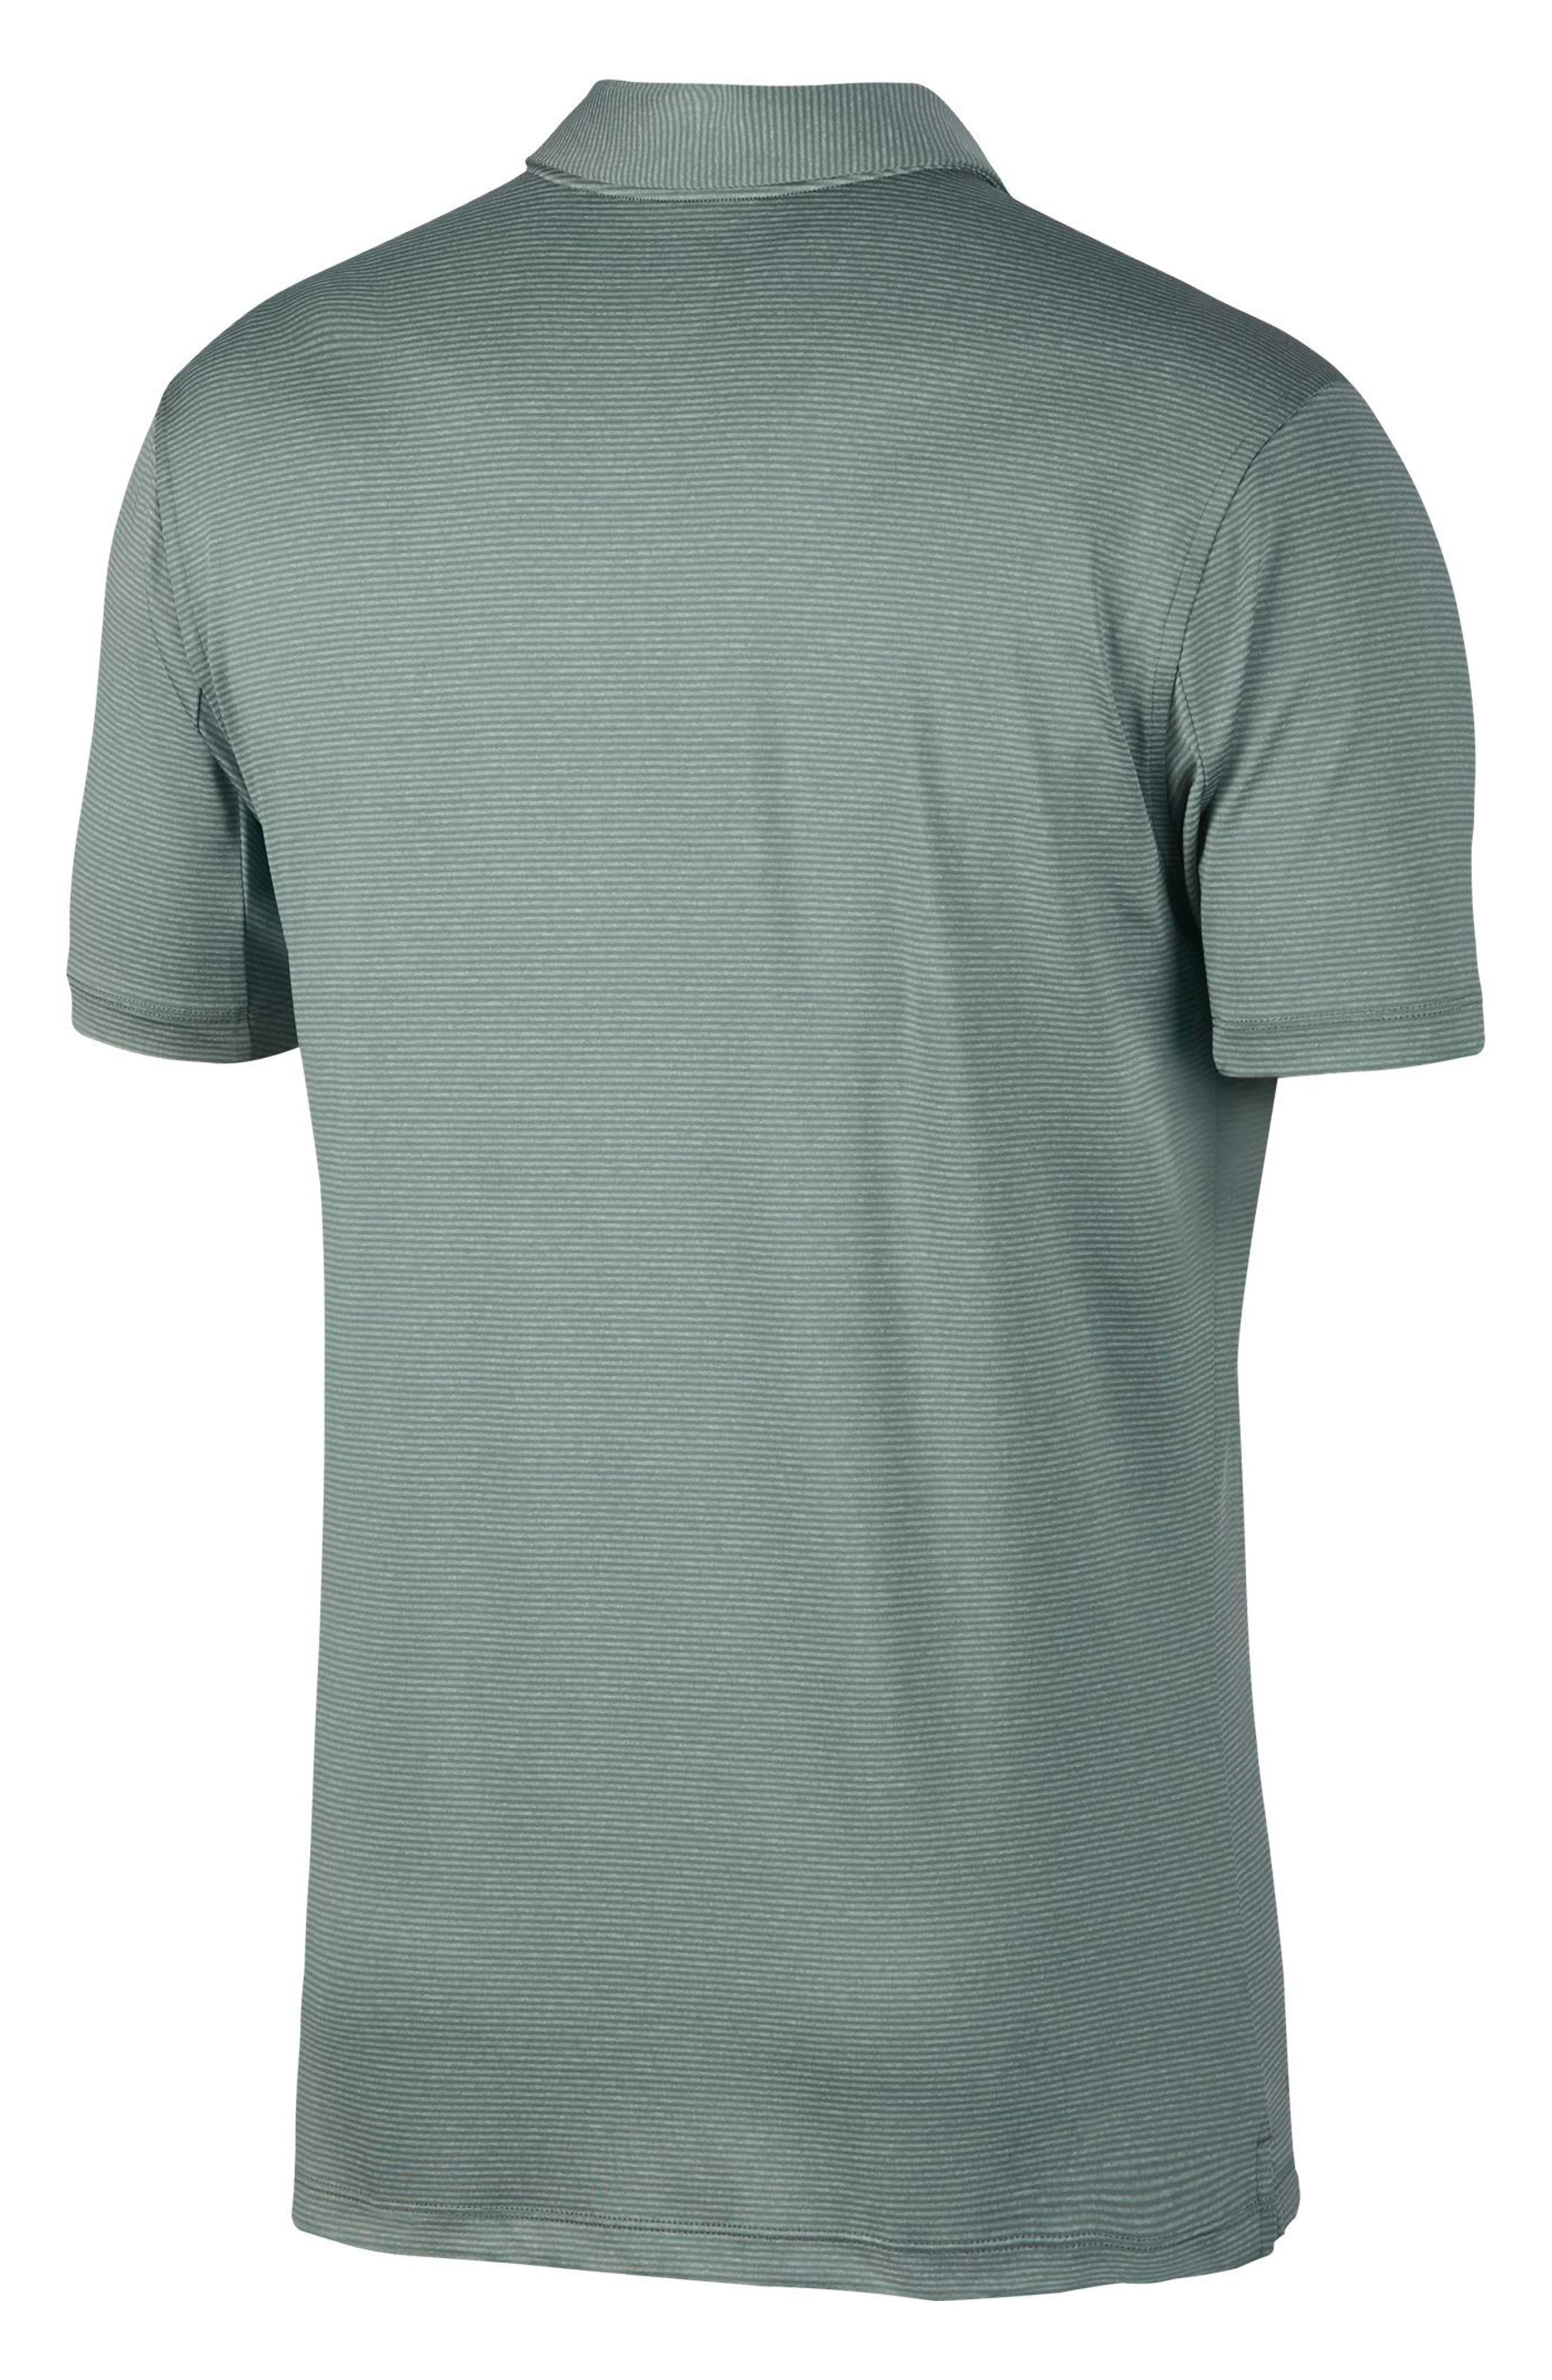 Dry Polo Shirt,                             Alternate thumbnail 7, color,                             CLAY GREEN/ BLACK